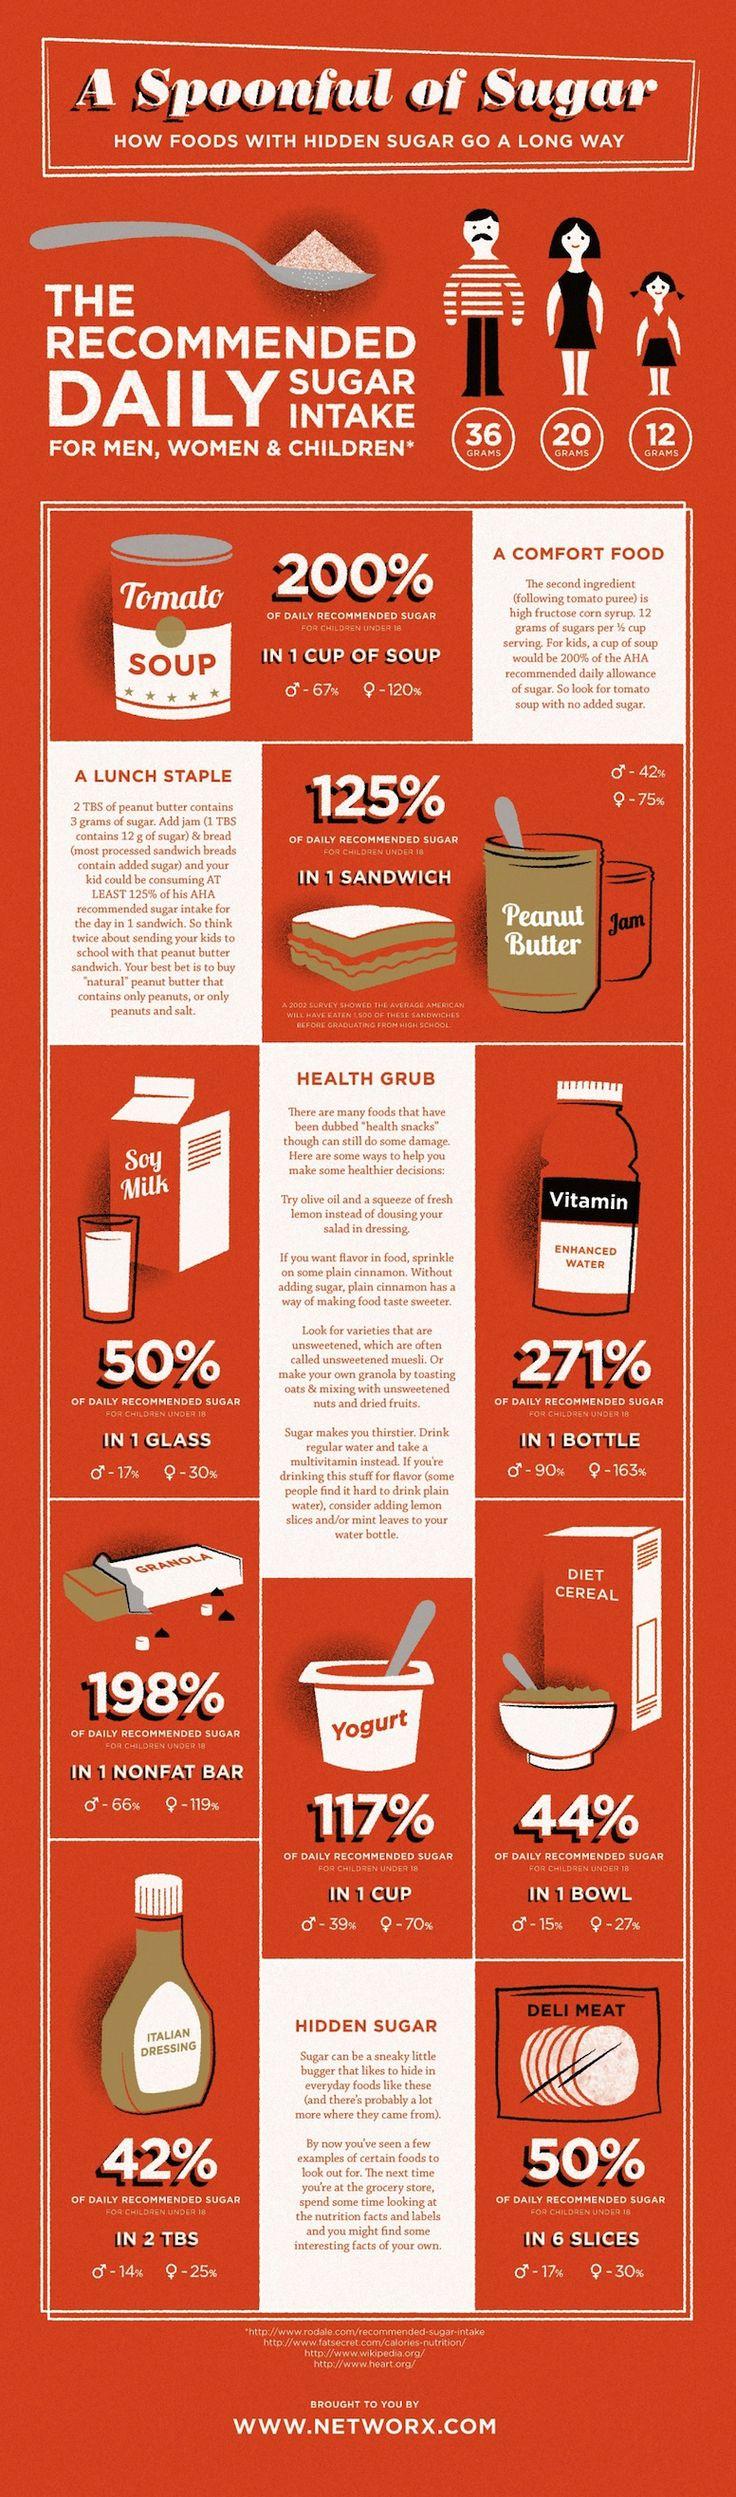 Candy Has Less Sugar Than A Sandwich? How foods with hidden sugar go a long way.